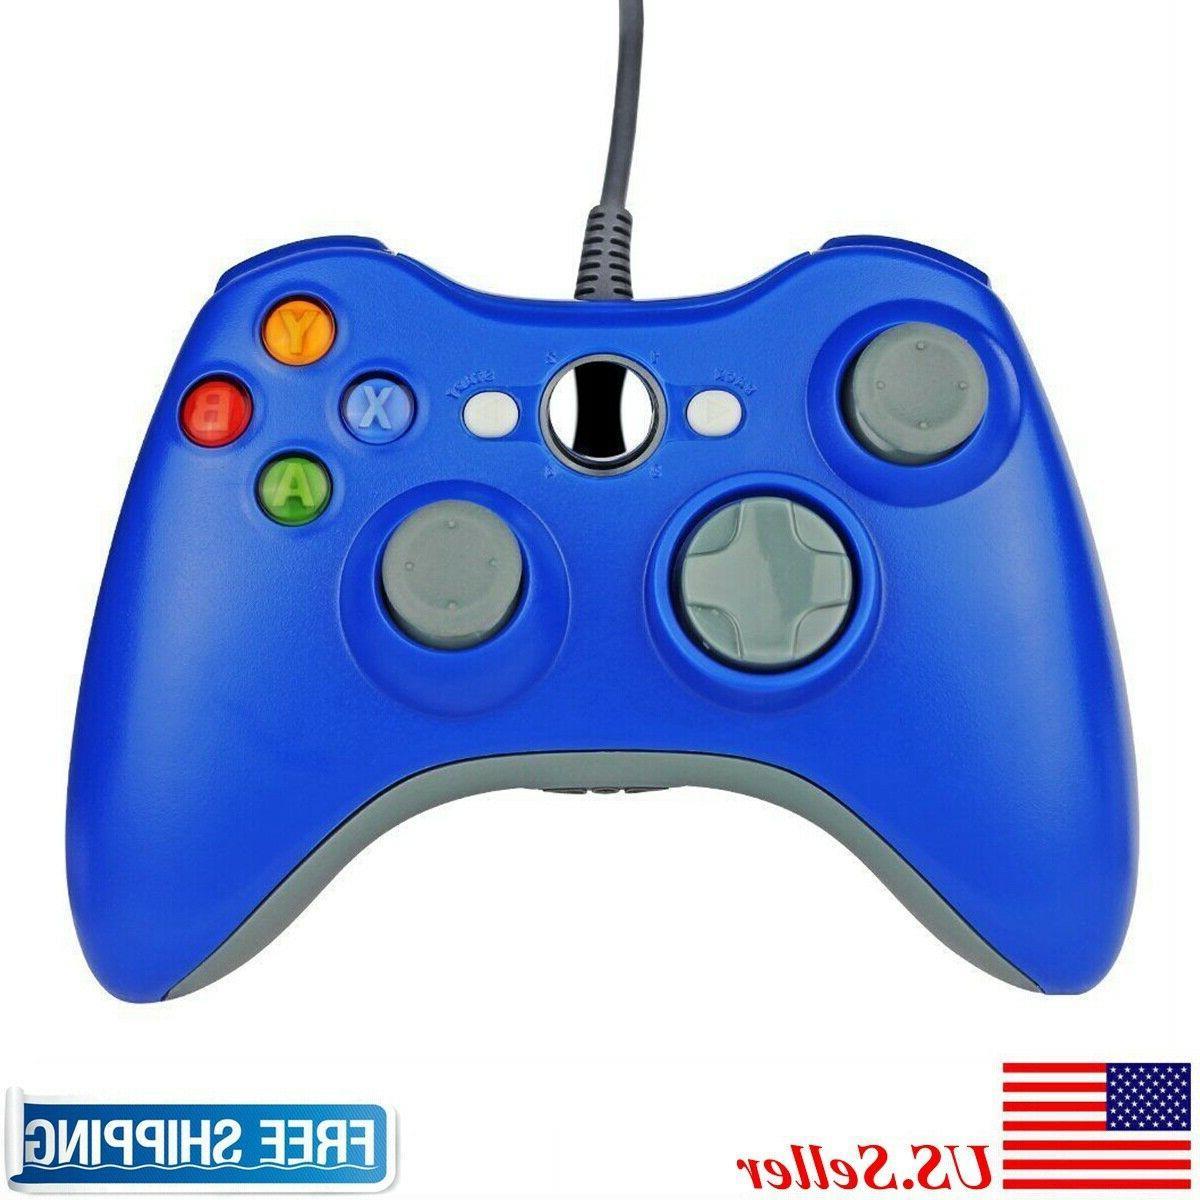 New USB GamePad For Microsoft Xbox 360 Console / PC